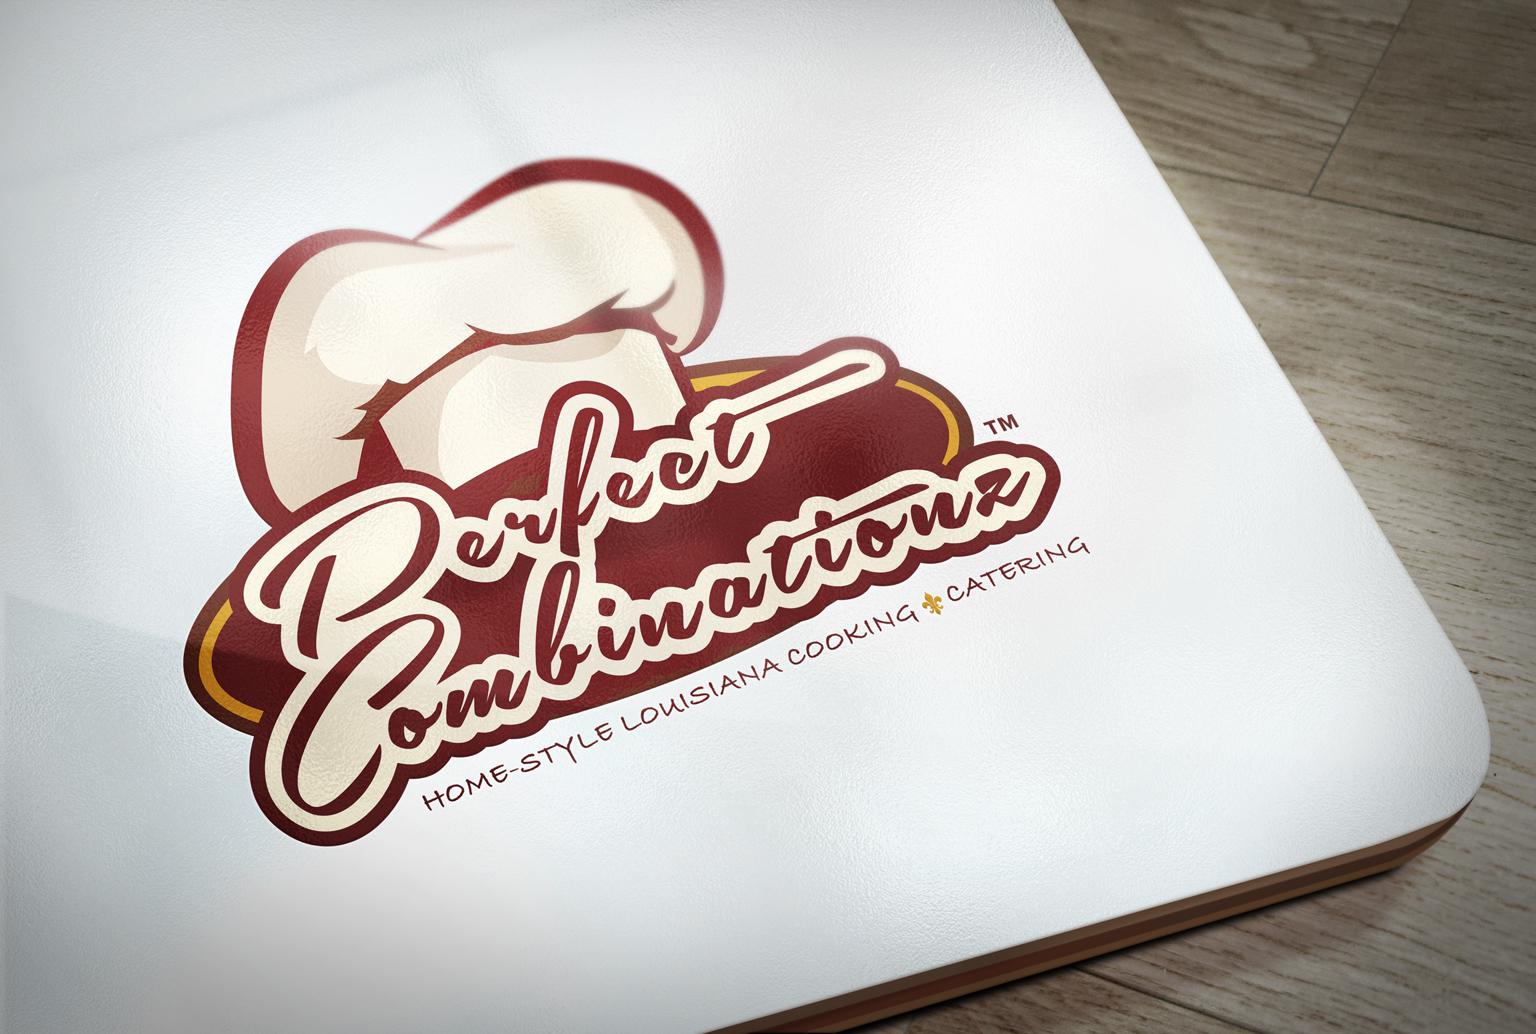 pce_logo2.jpg